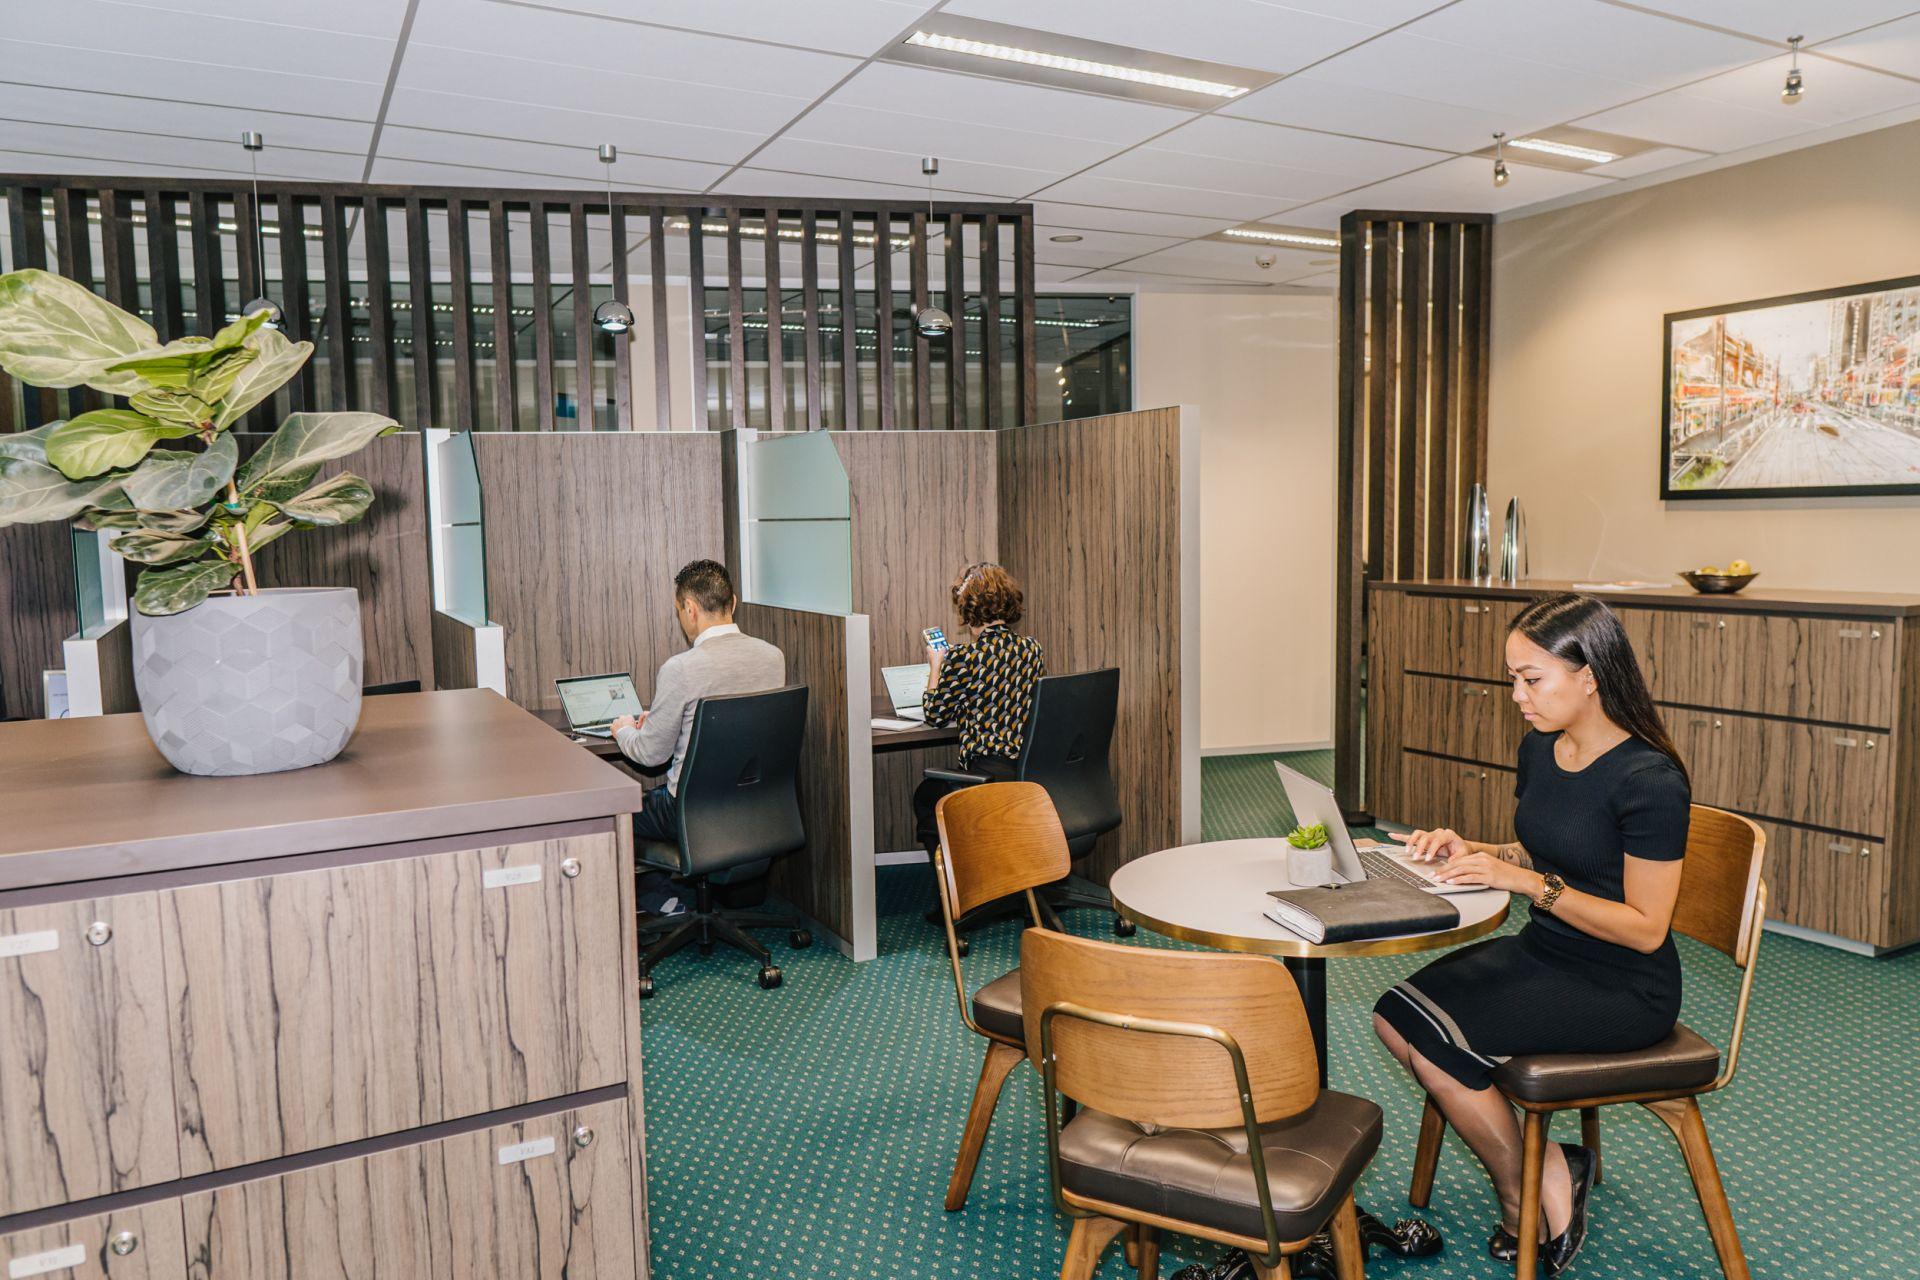 Servcorp Deloitte Parramatta, Sydney